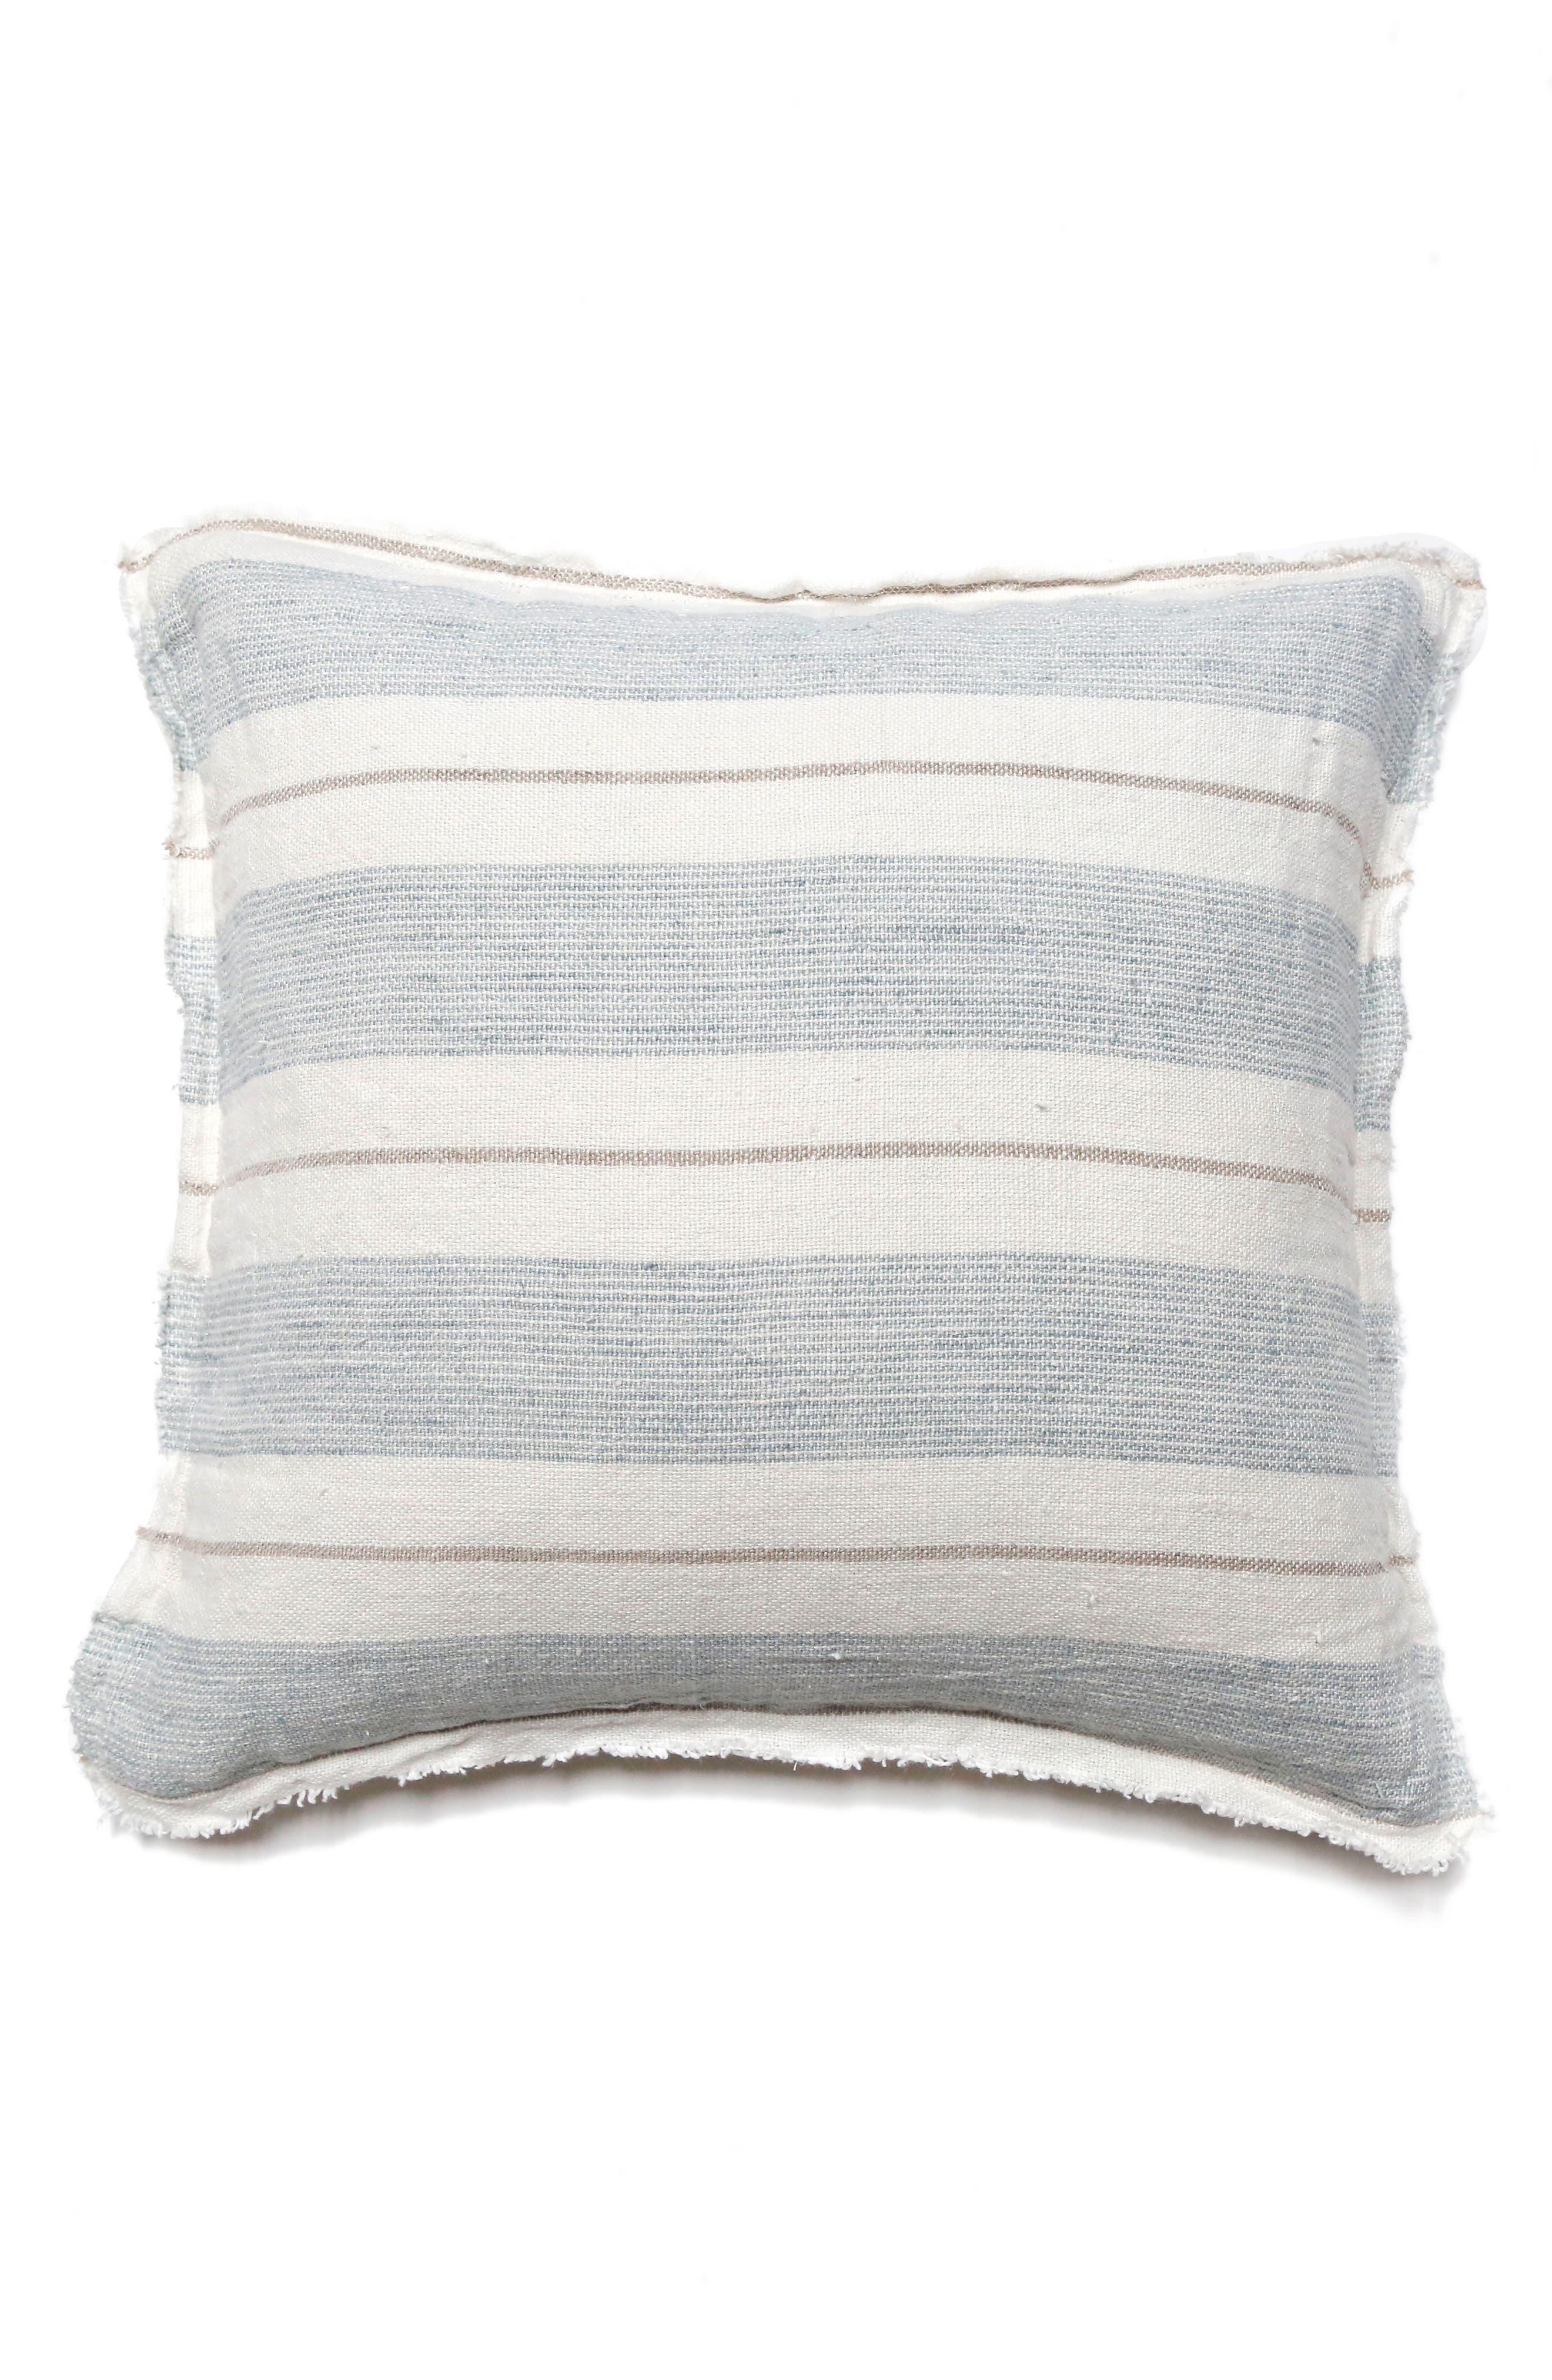 Main Image - Pom Pom at Home Laguna Accent Pillow